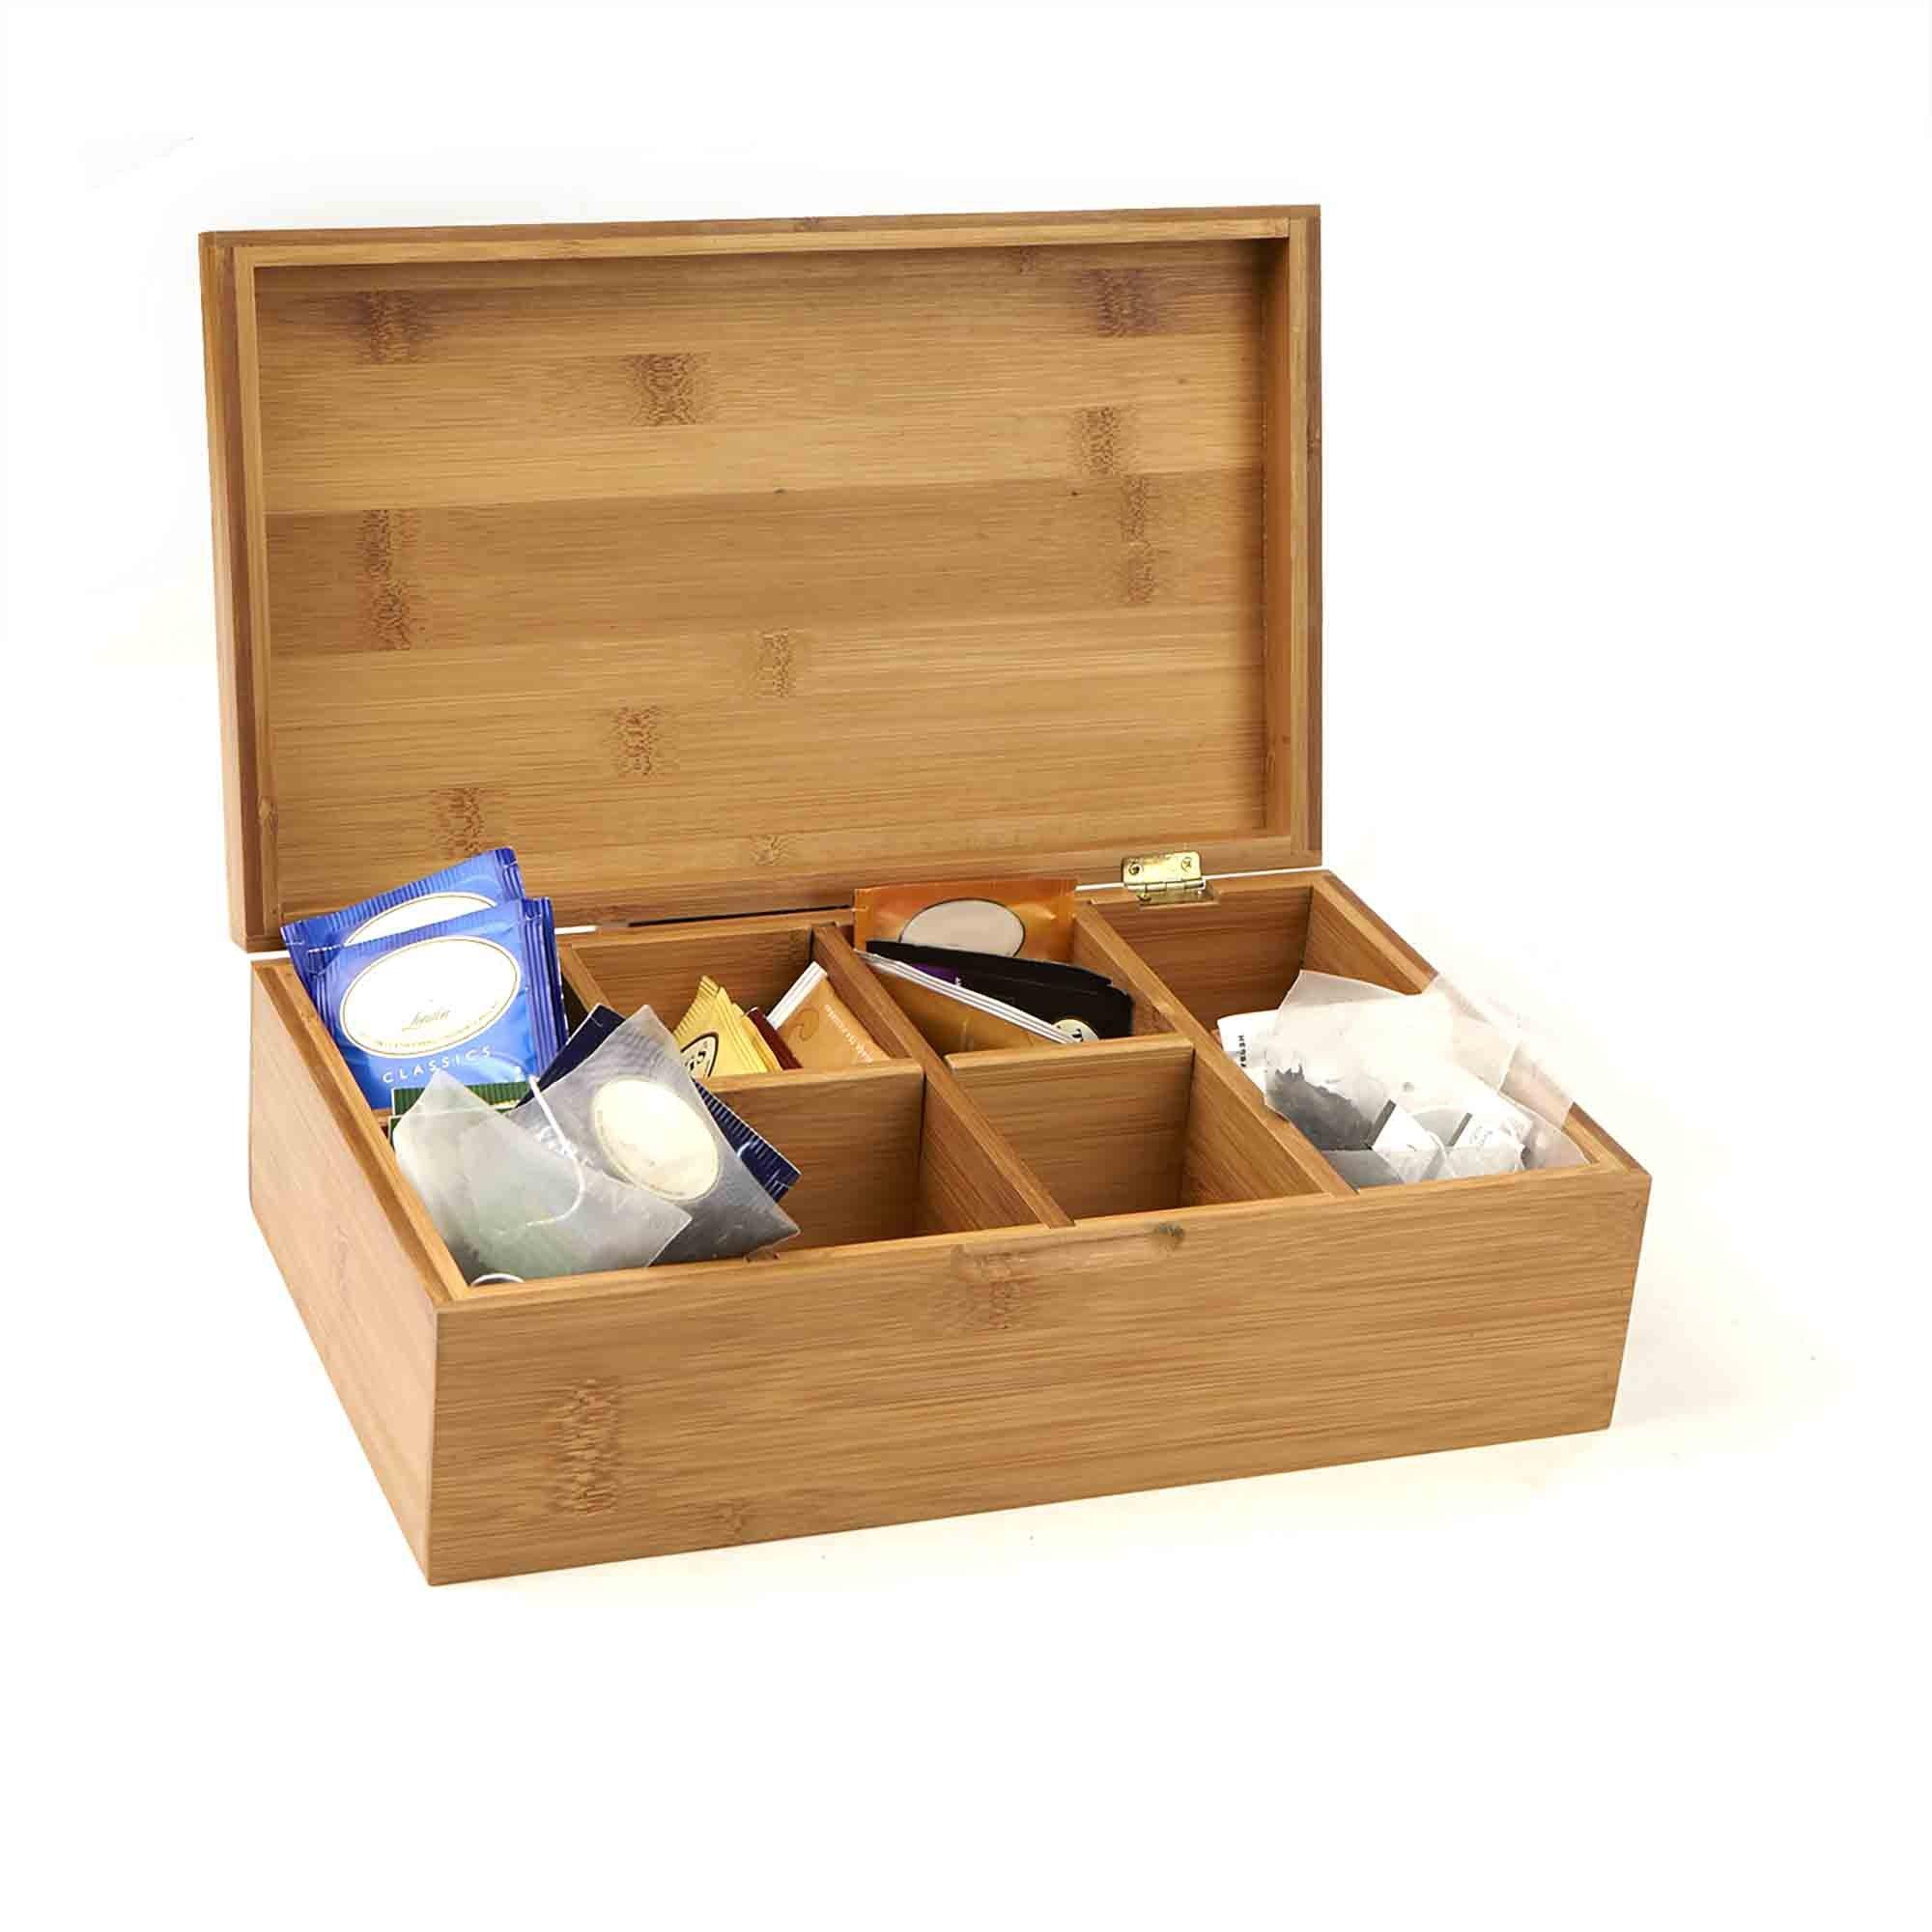 Mind Reader Bamboo Tea Box Storage Organizer, 8 Compartment Chest Box, Natural